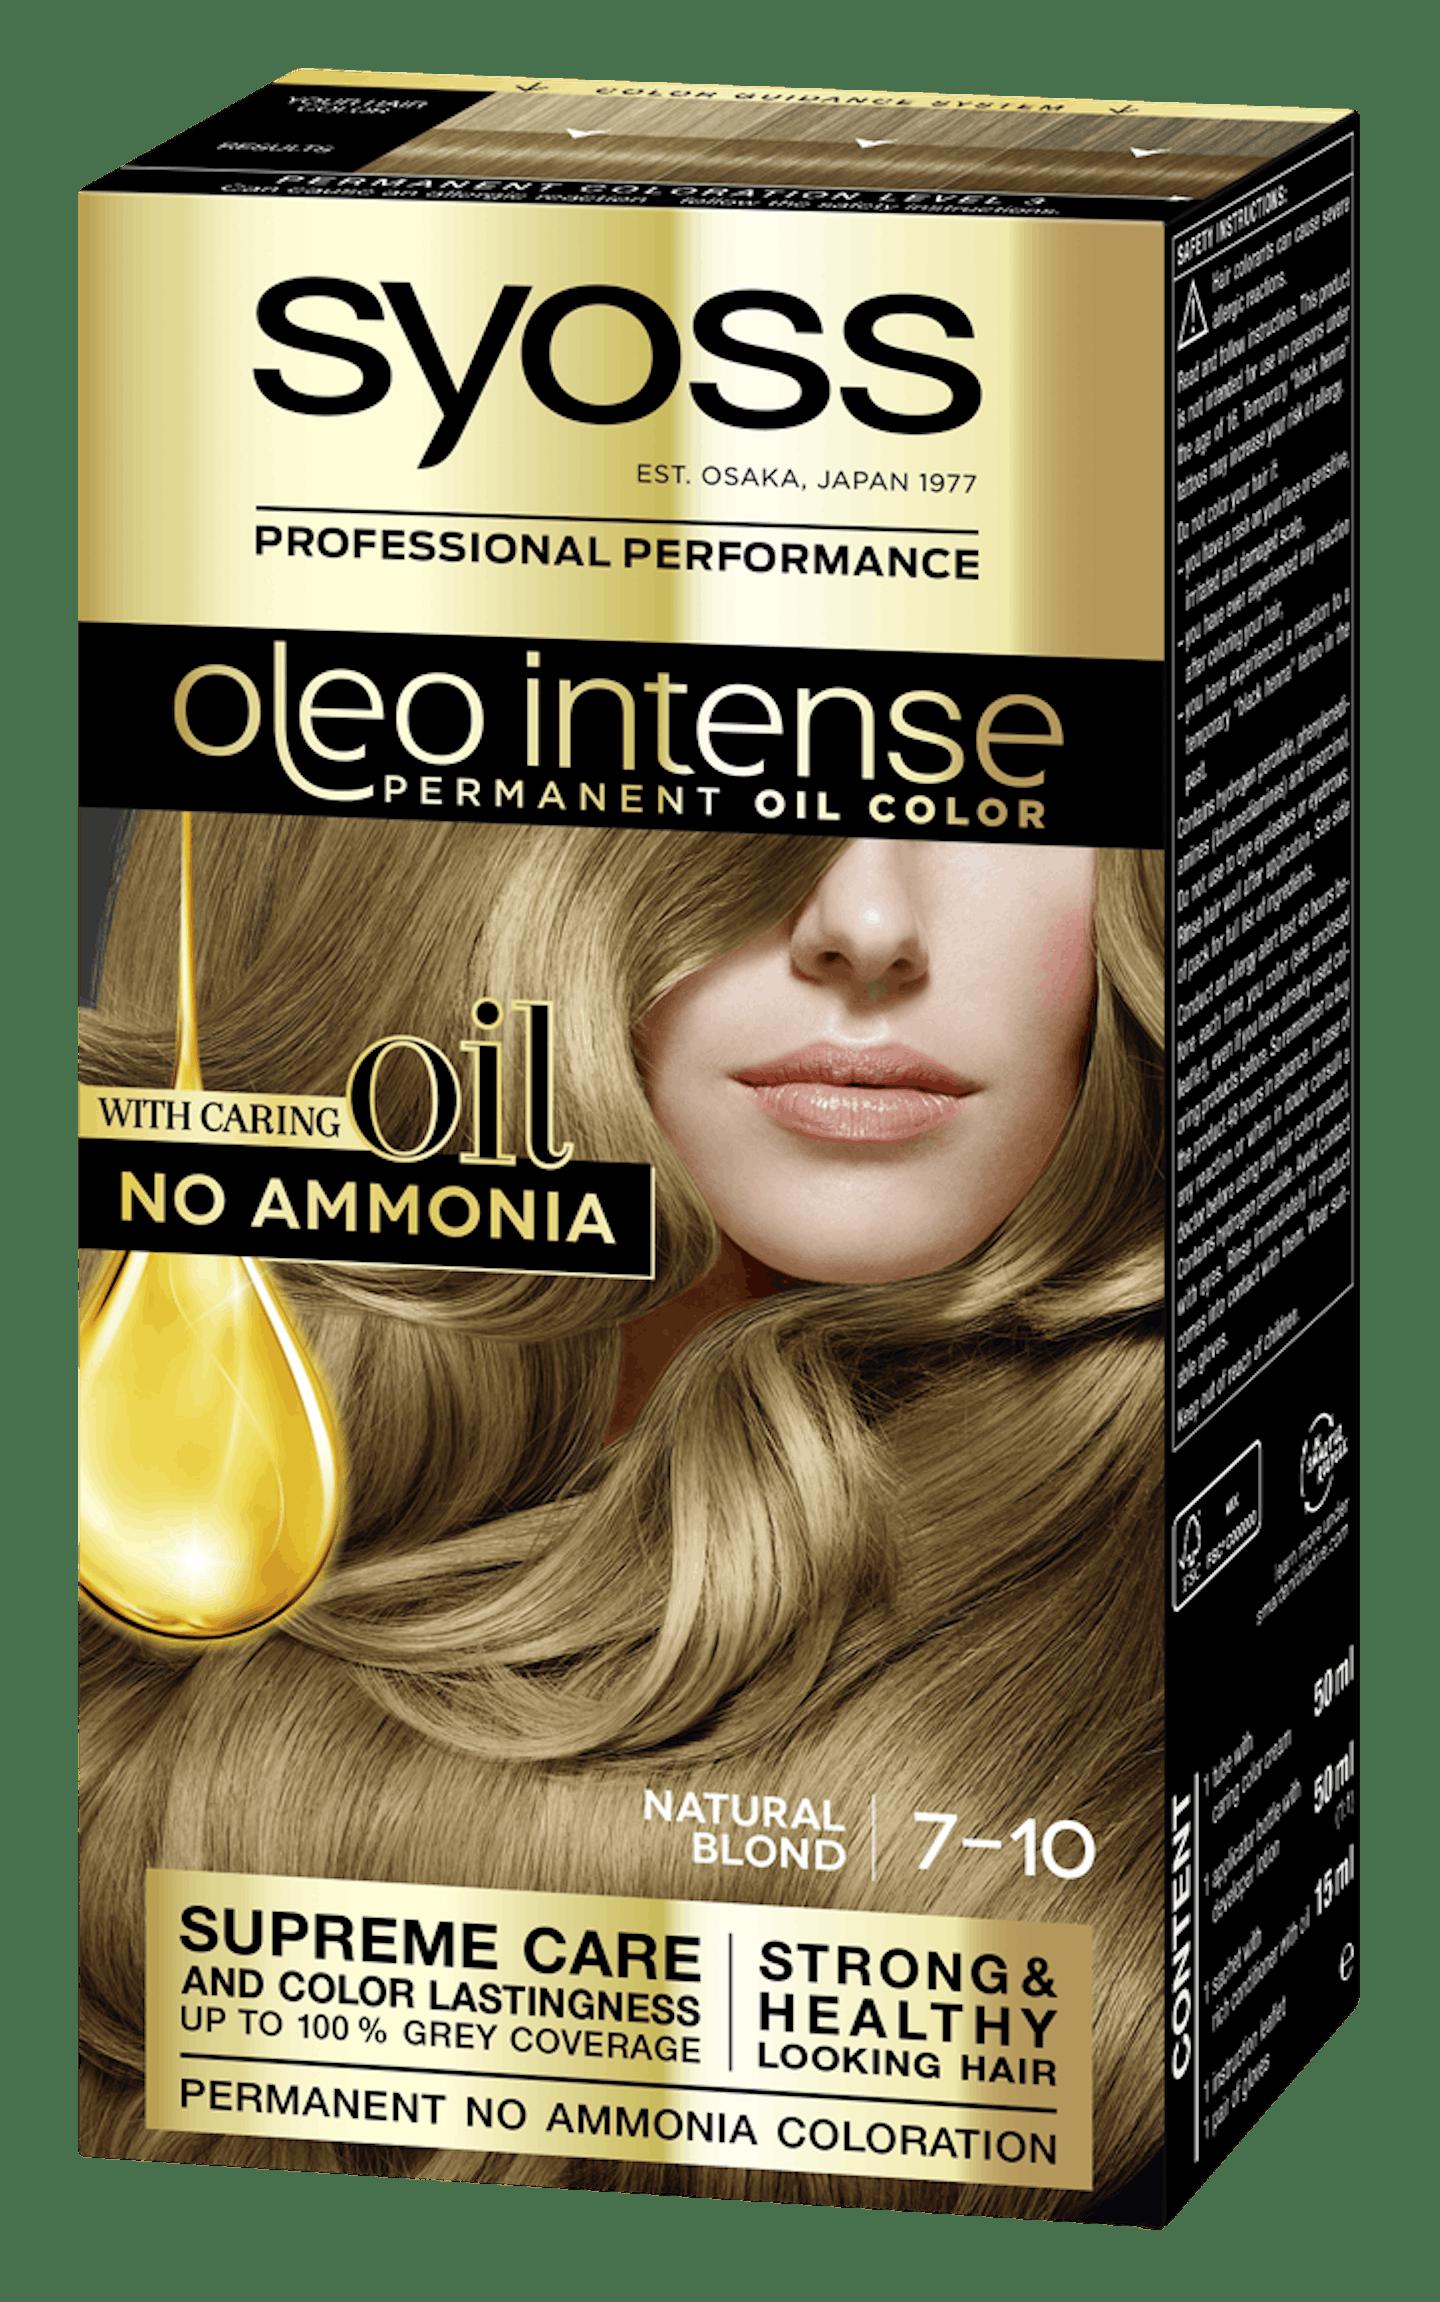 Natural Blond 7-10